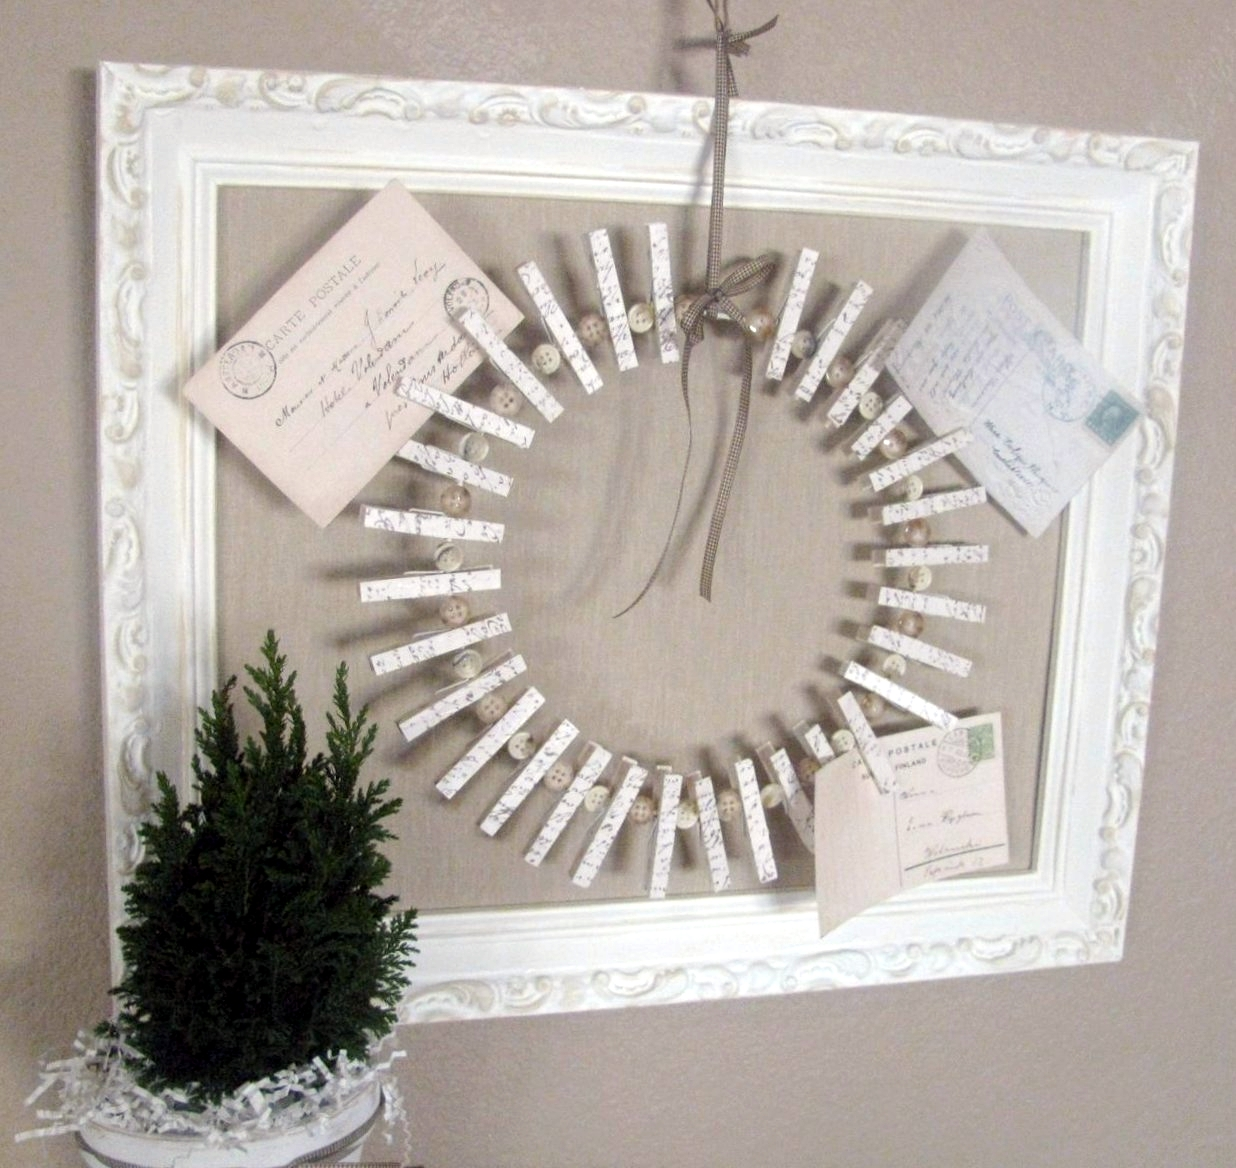 Christmas Card Holder Wreath | Fabulous ideas - all what WE like